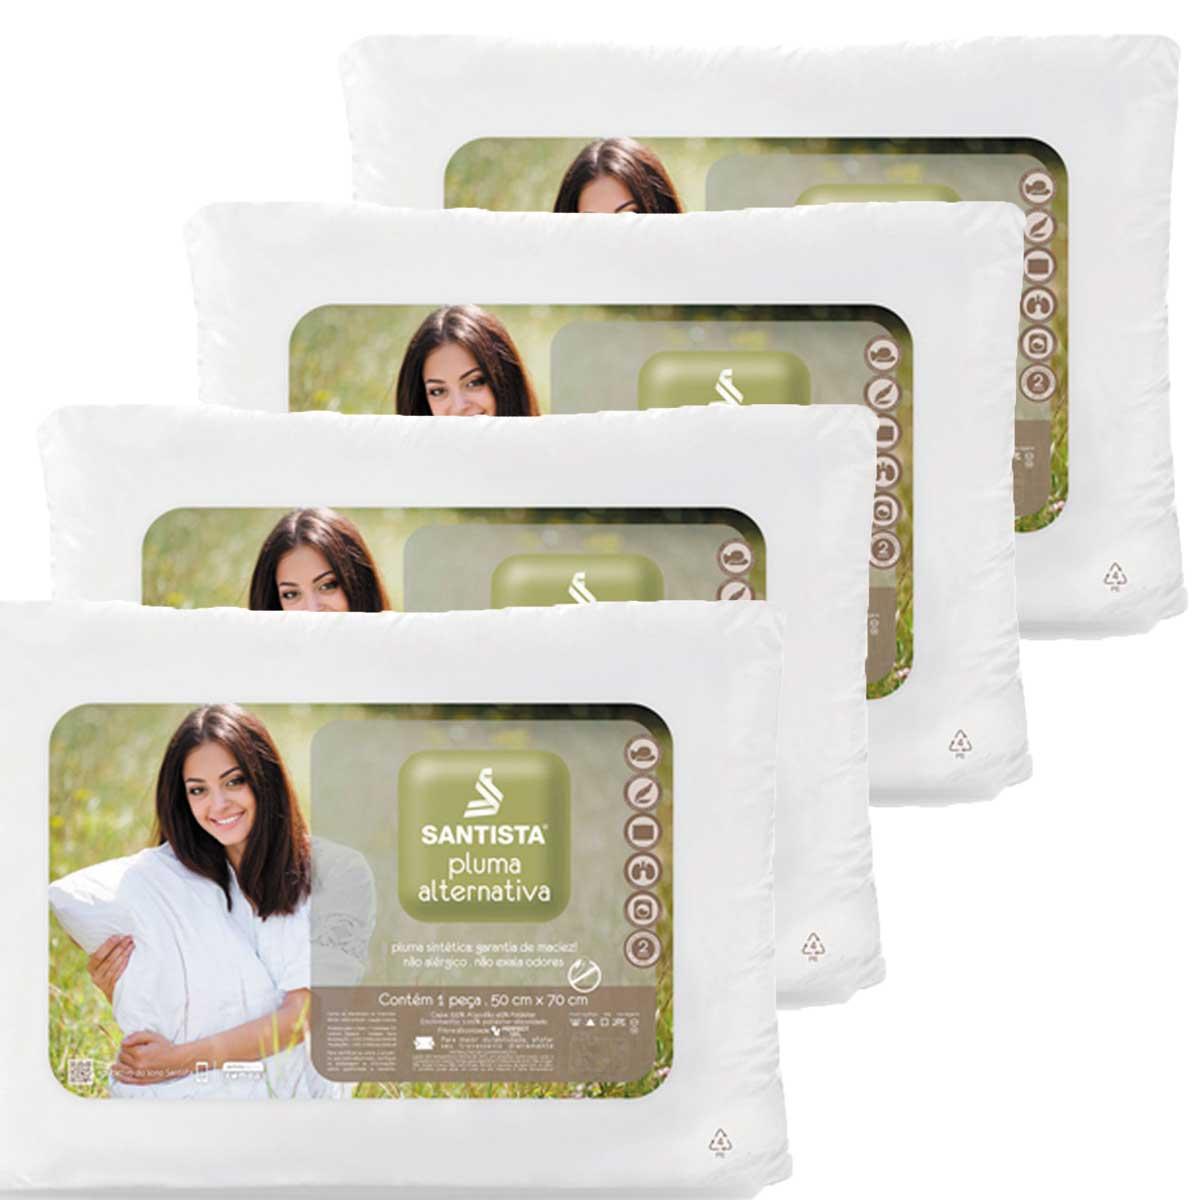 Kit 4 Travesseiros Pluma Alternativa Fibra Siliconada 50 x 70 Santista